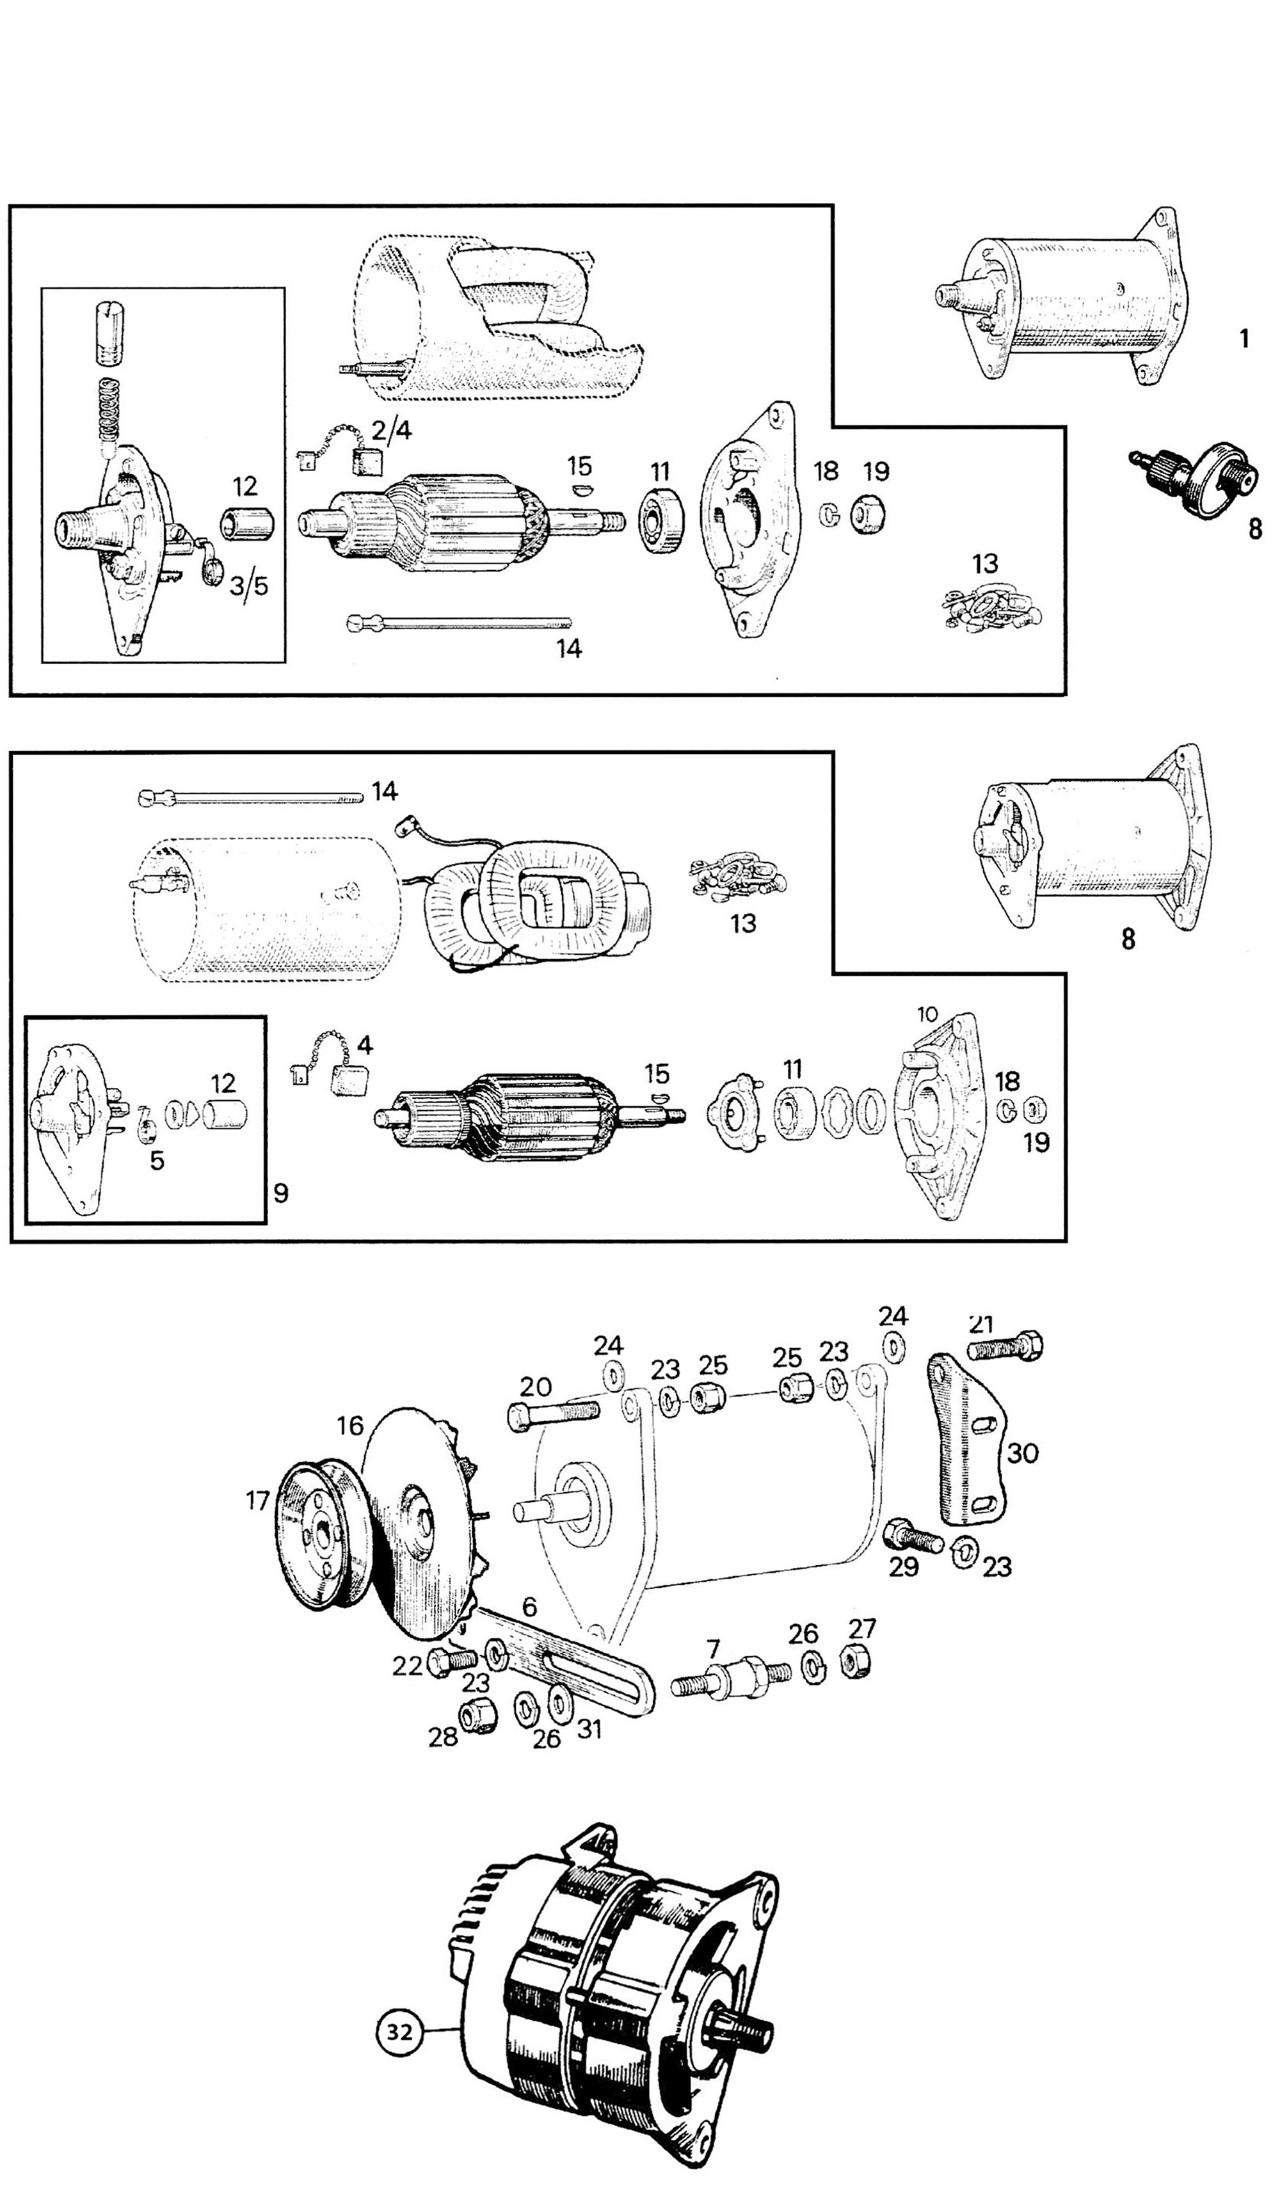 Sprite Catalog Page 10-2